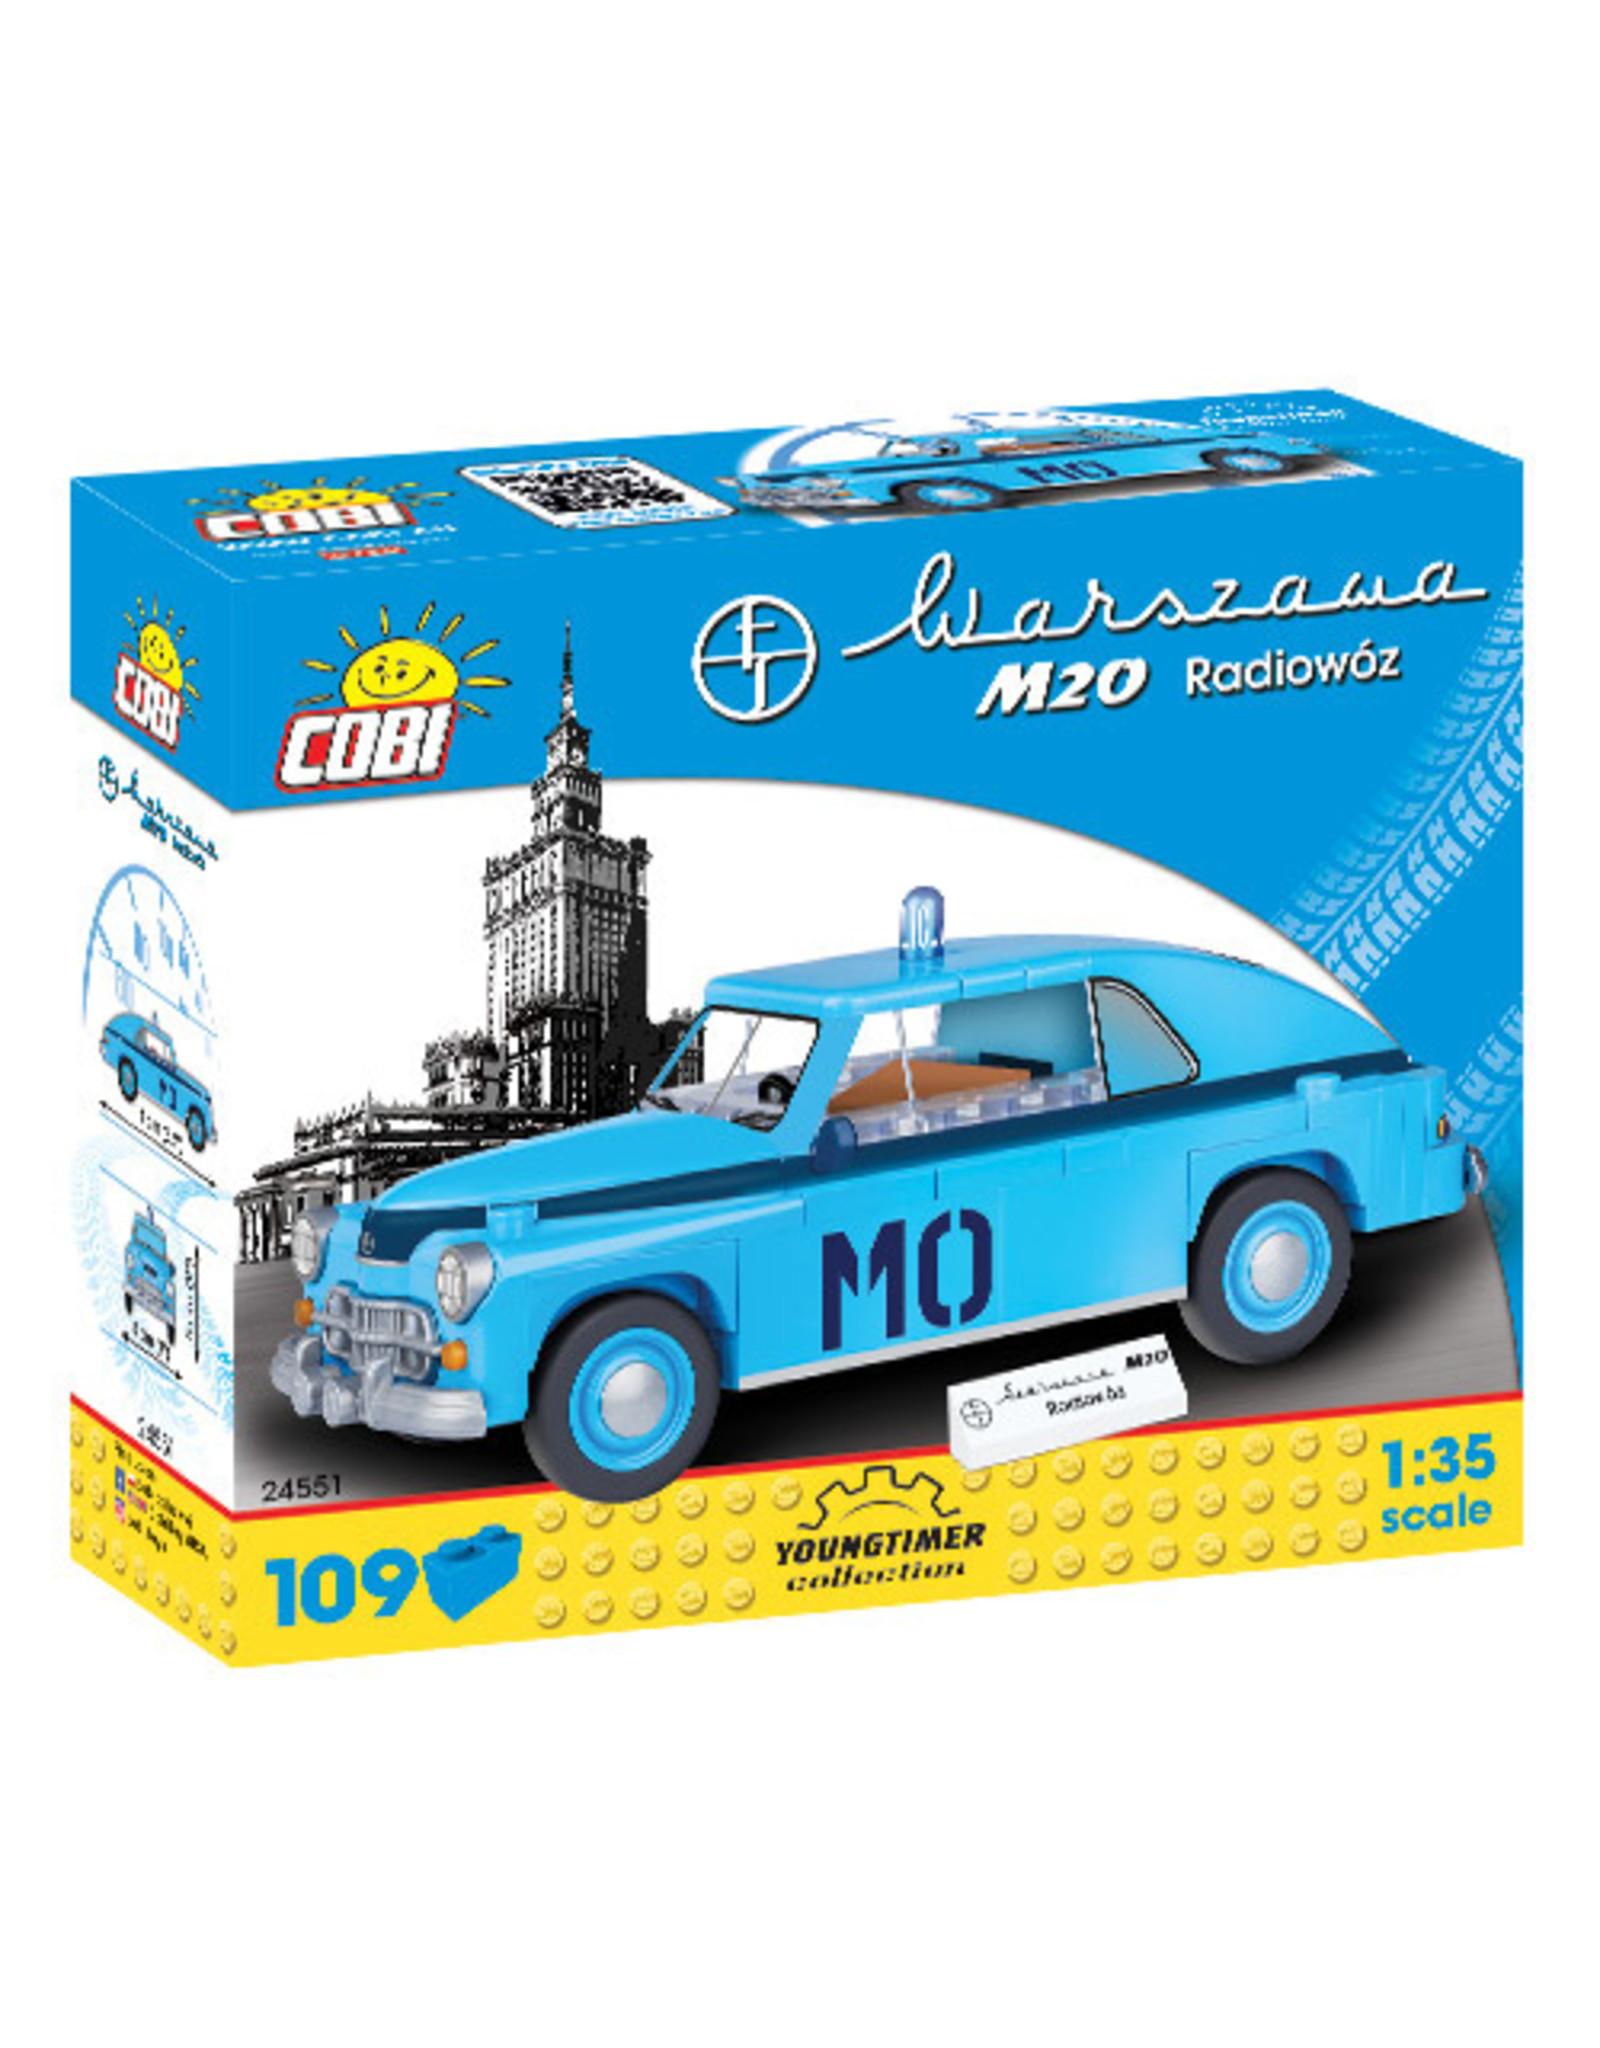 COBI COBI 24551 - Warszawa M20 Politieauto